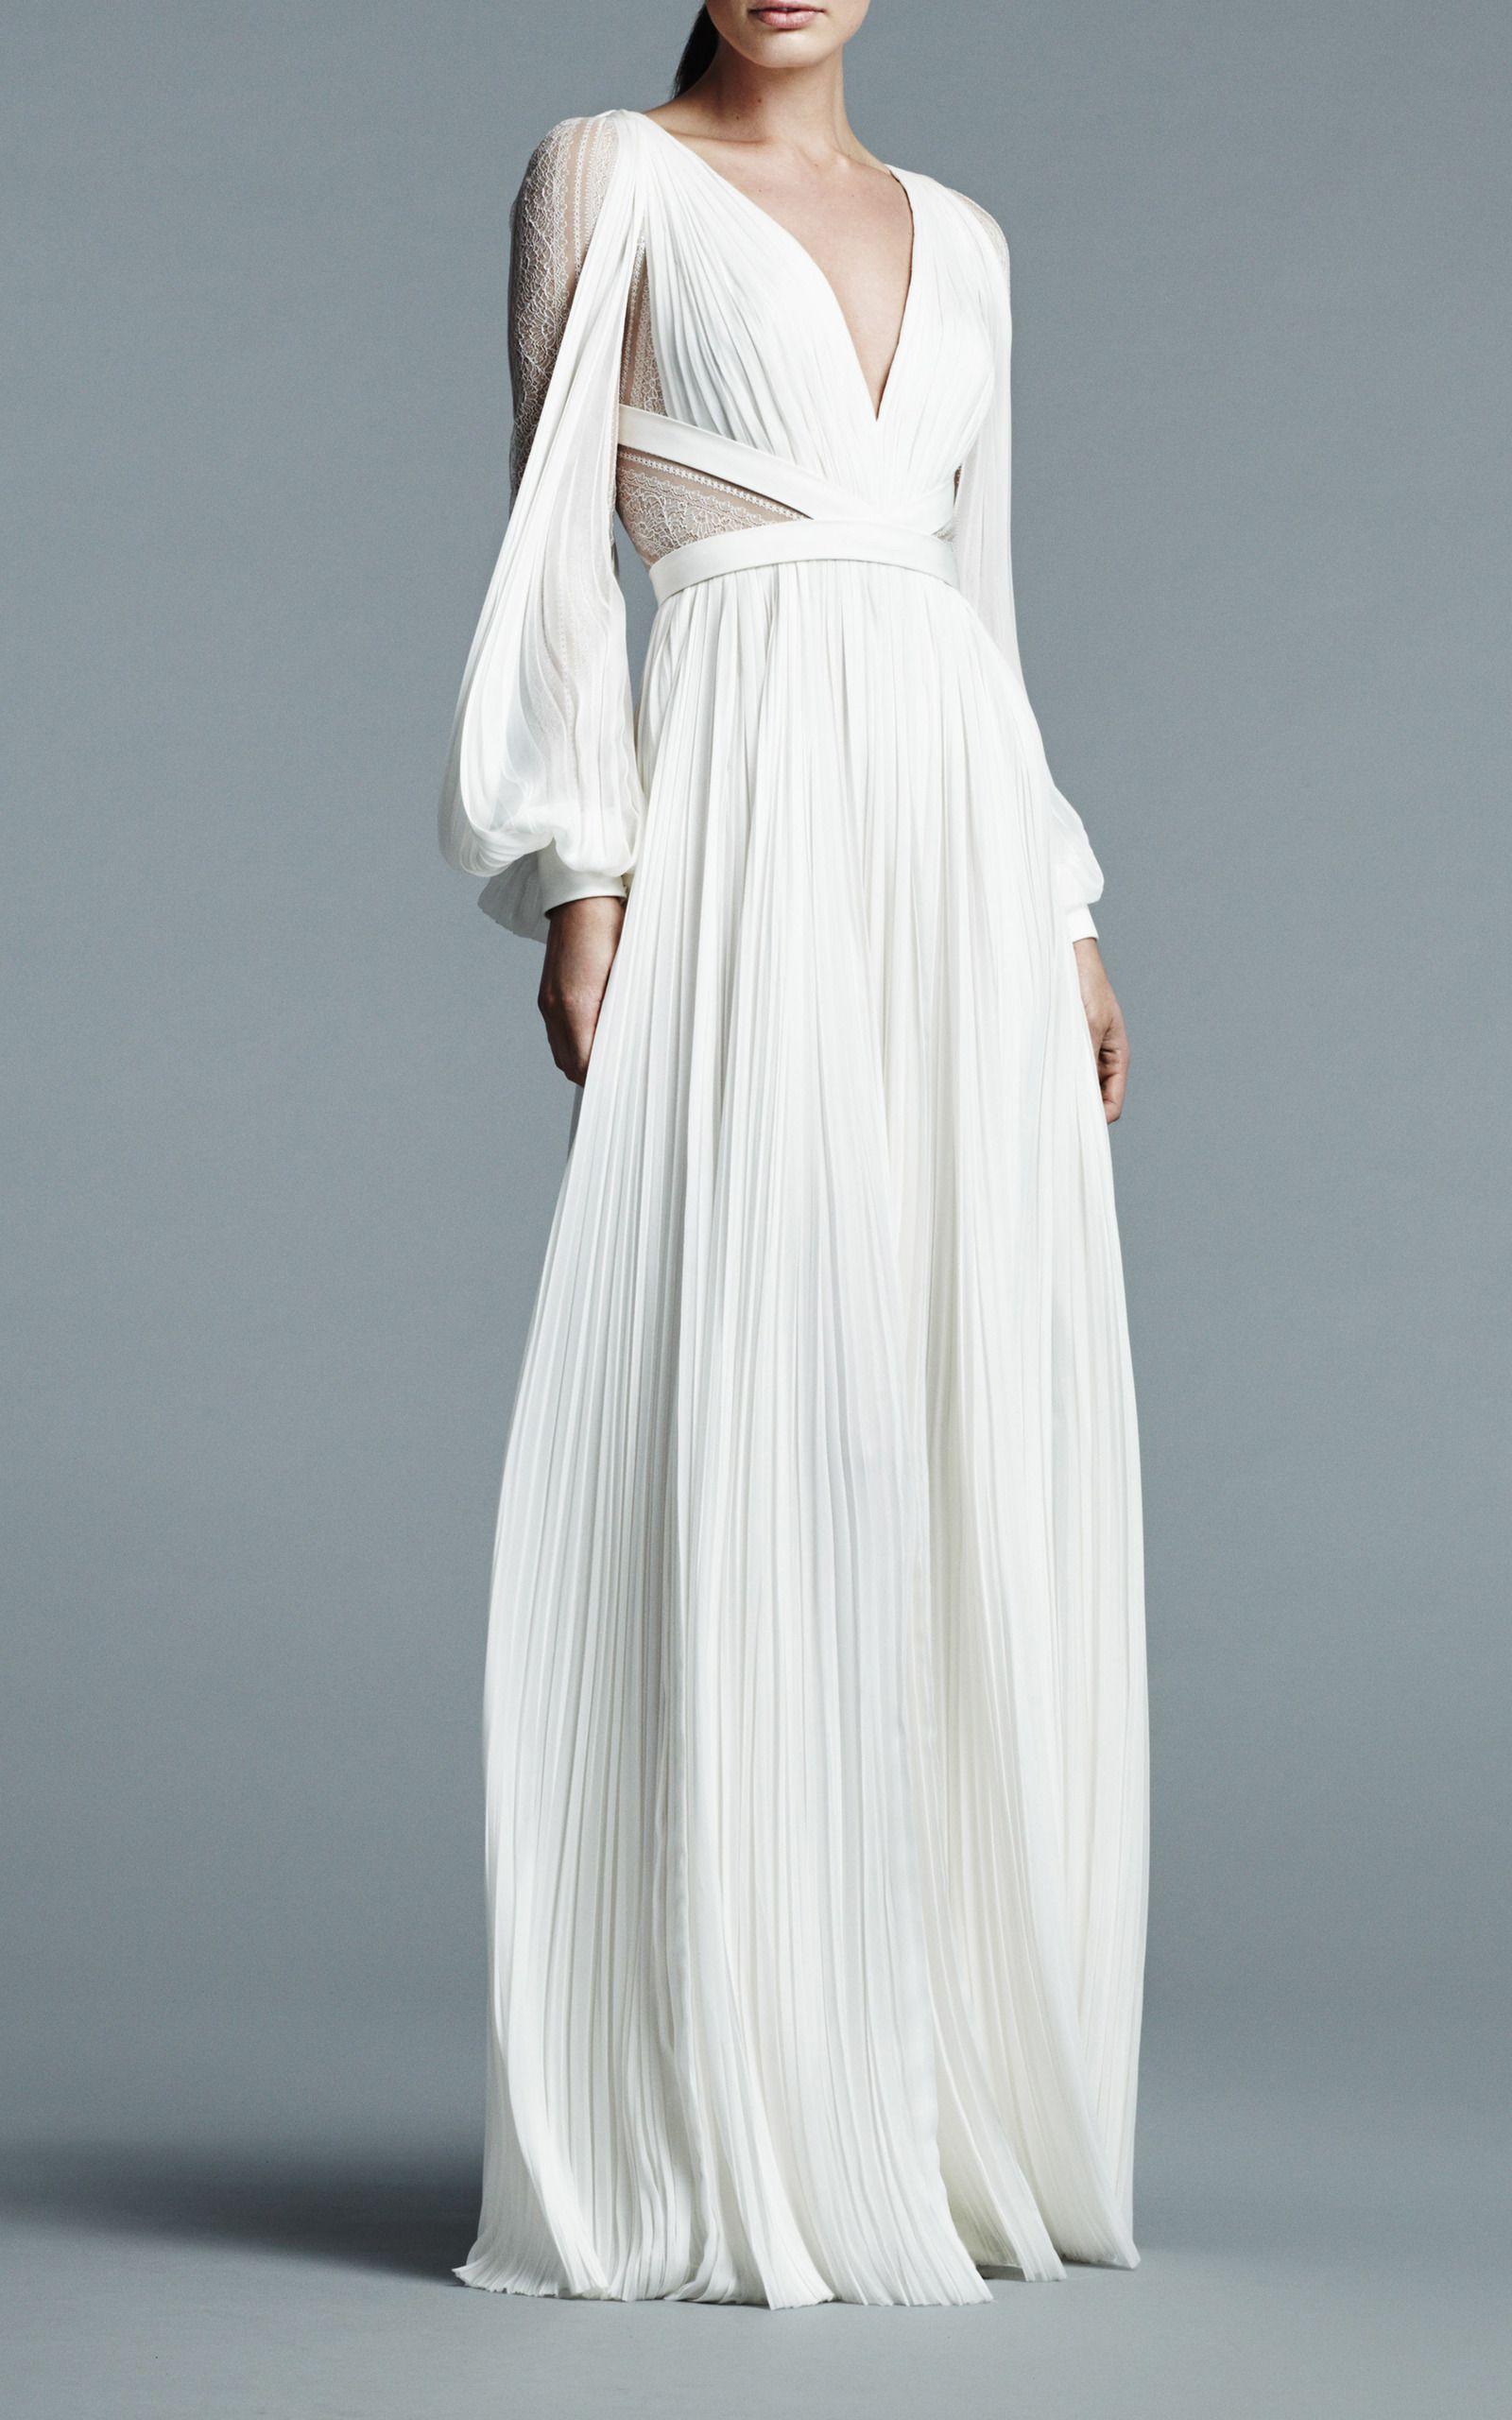 J. Mendel The Camilla | ~ Wedding Gown pt2 ~ | Pinterest | Camilla ...